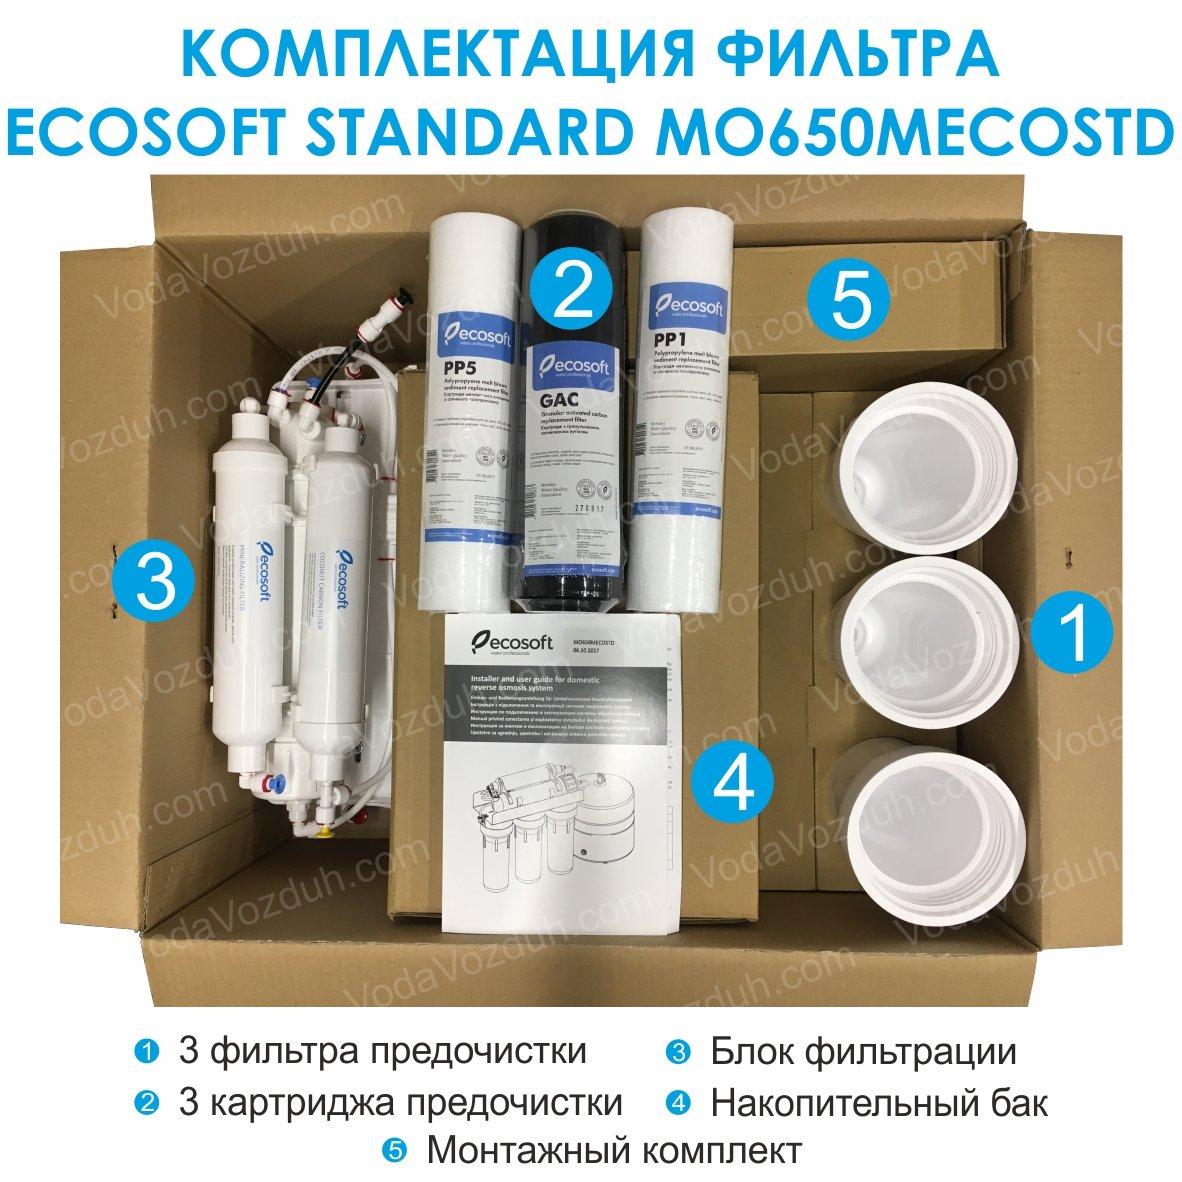 Ecosoft Standard 6-50M комплектация